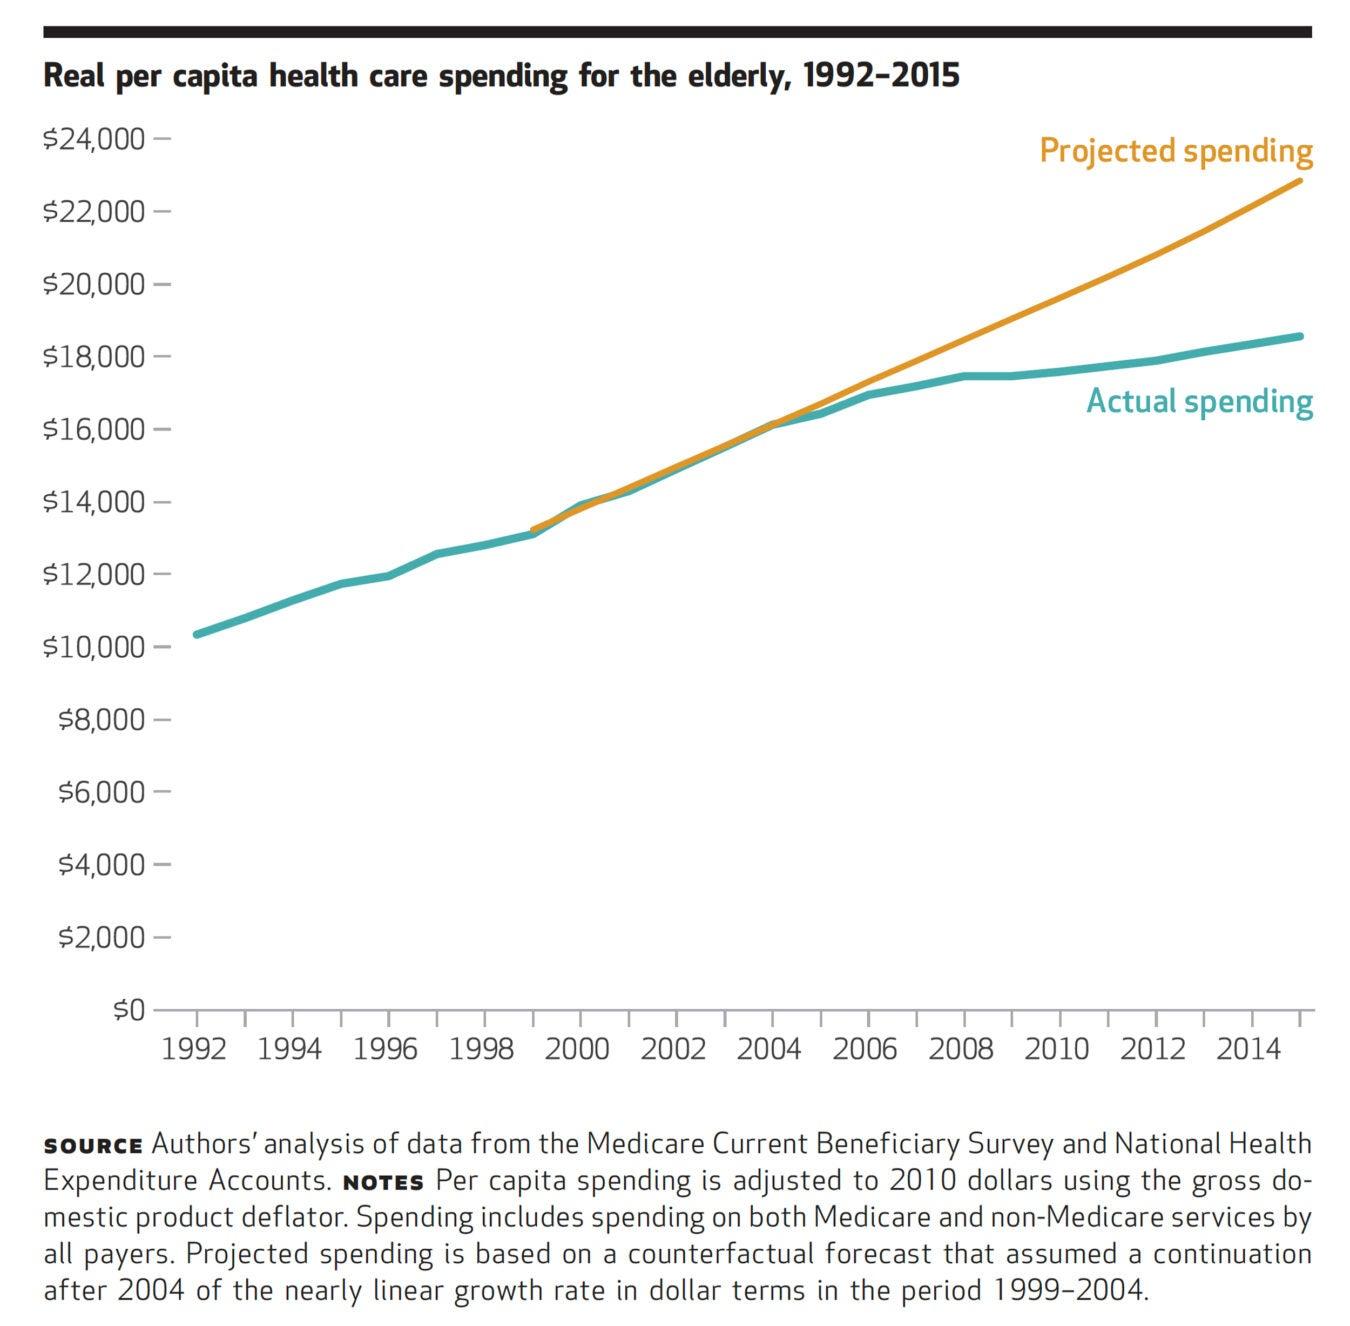 Real Per Capita Health Care Spending for the Elderly 1992-2015